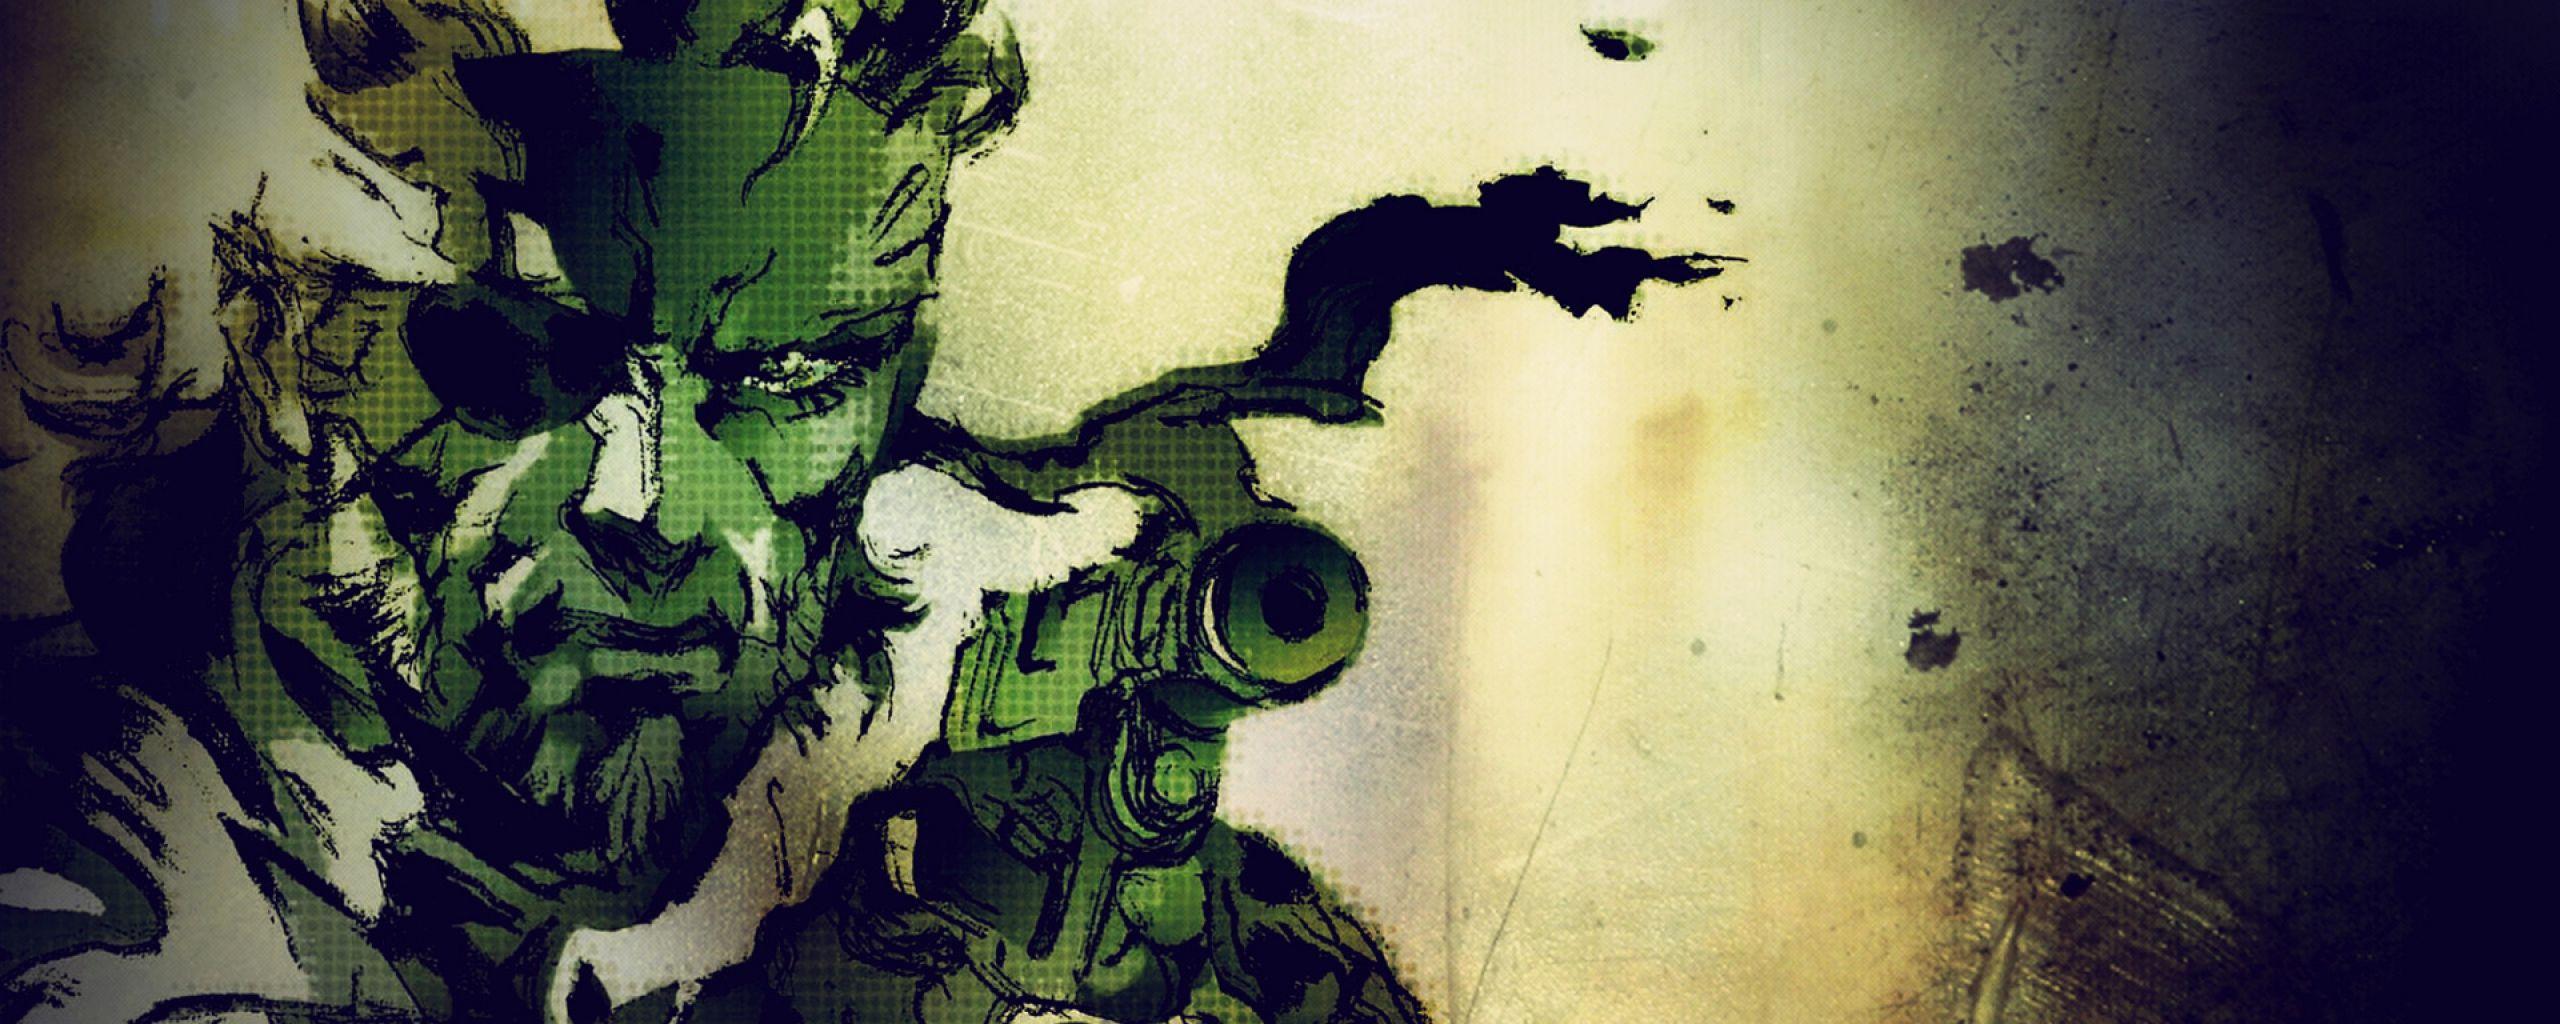 Dual Monitor Resolution Metal Gear Solid Wallpapers Hd Desktop